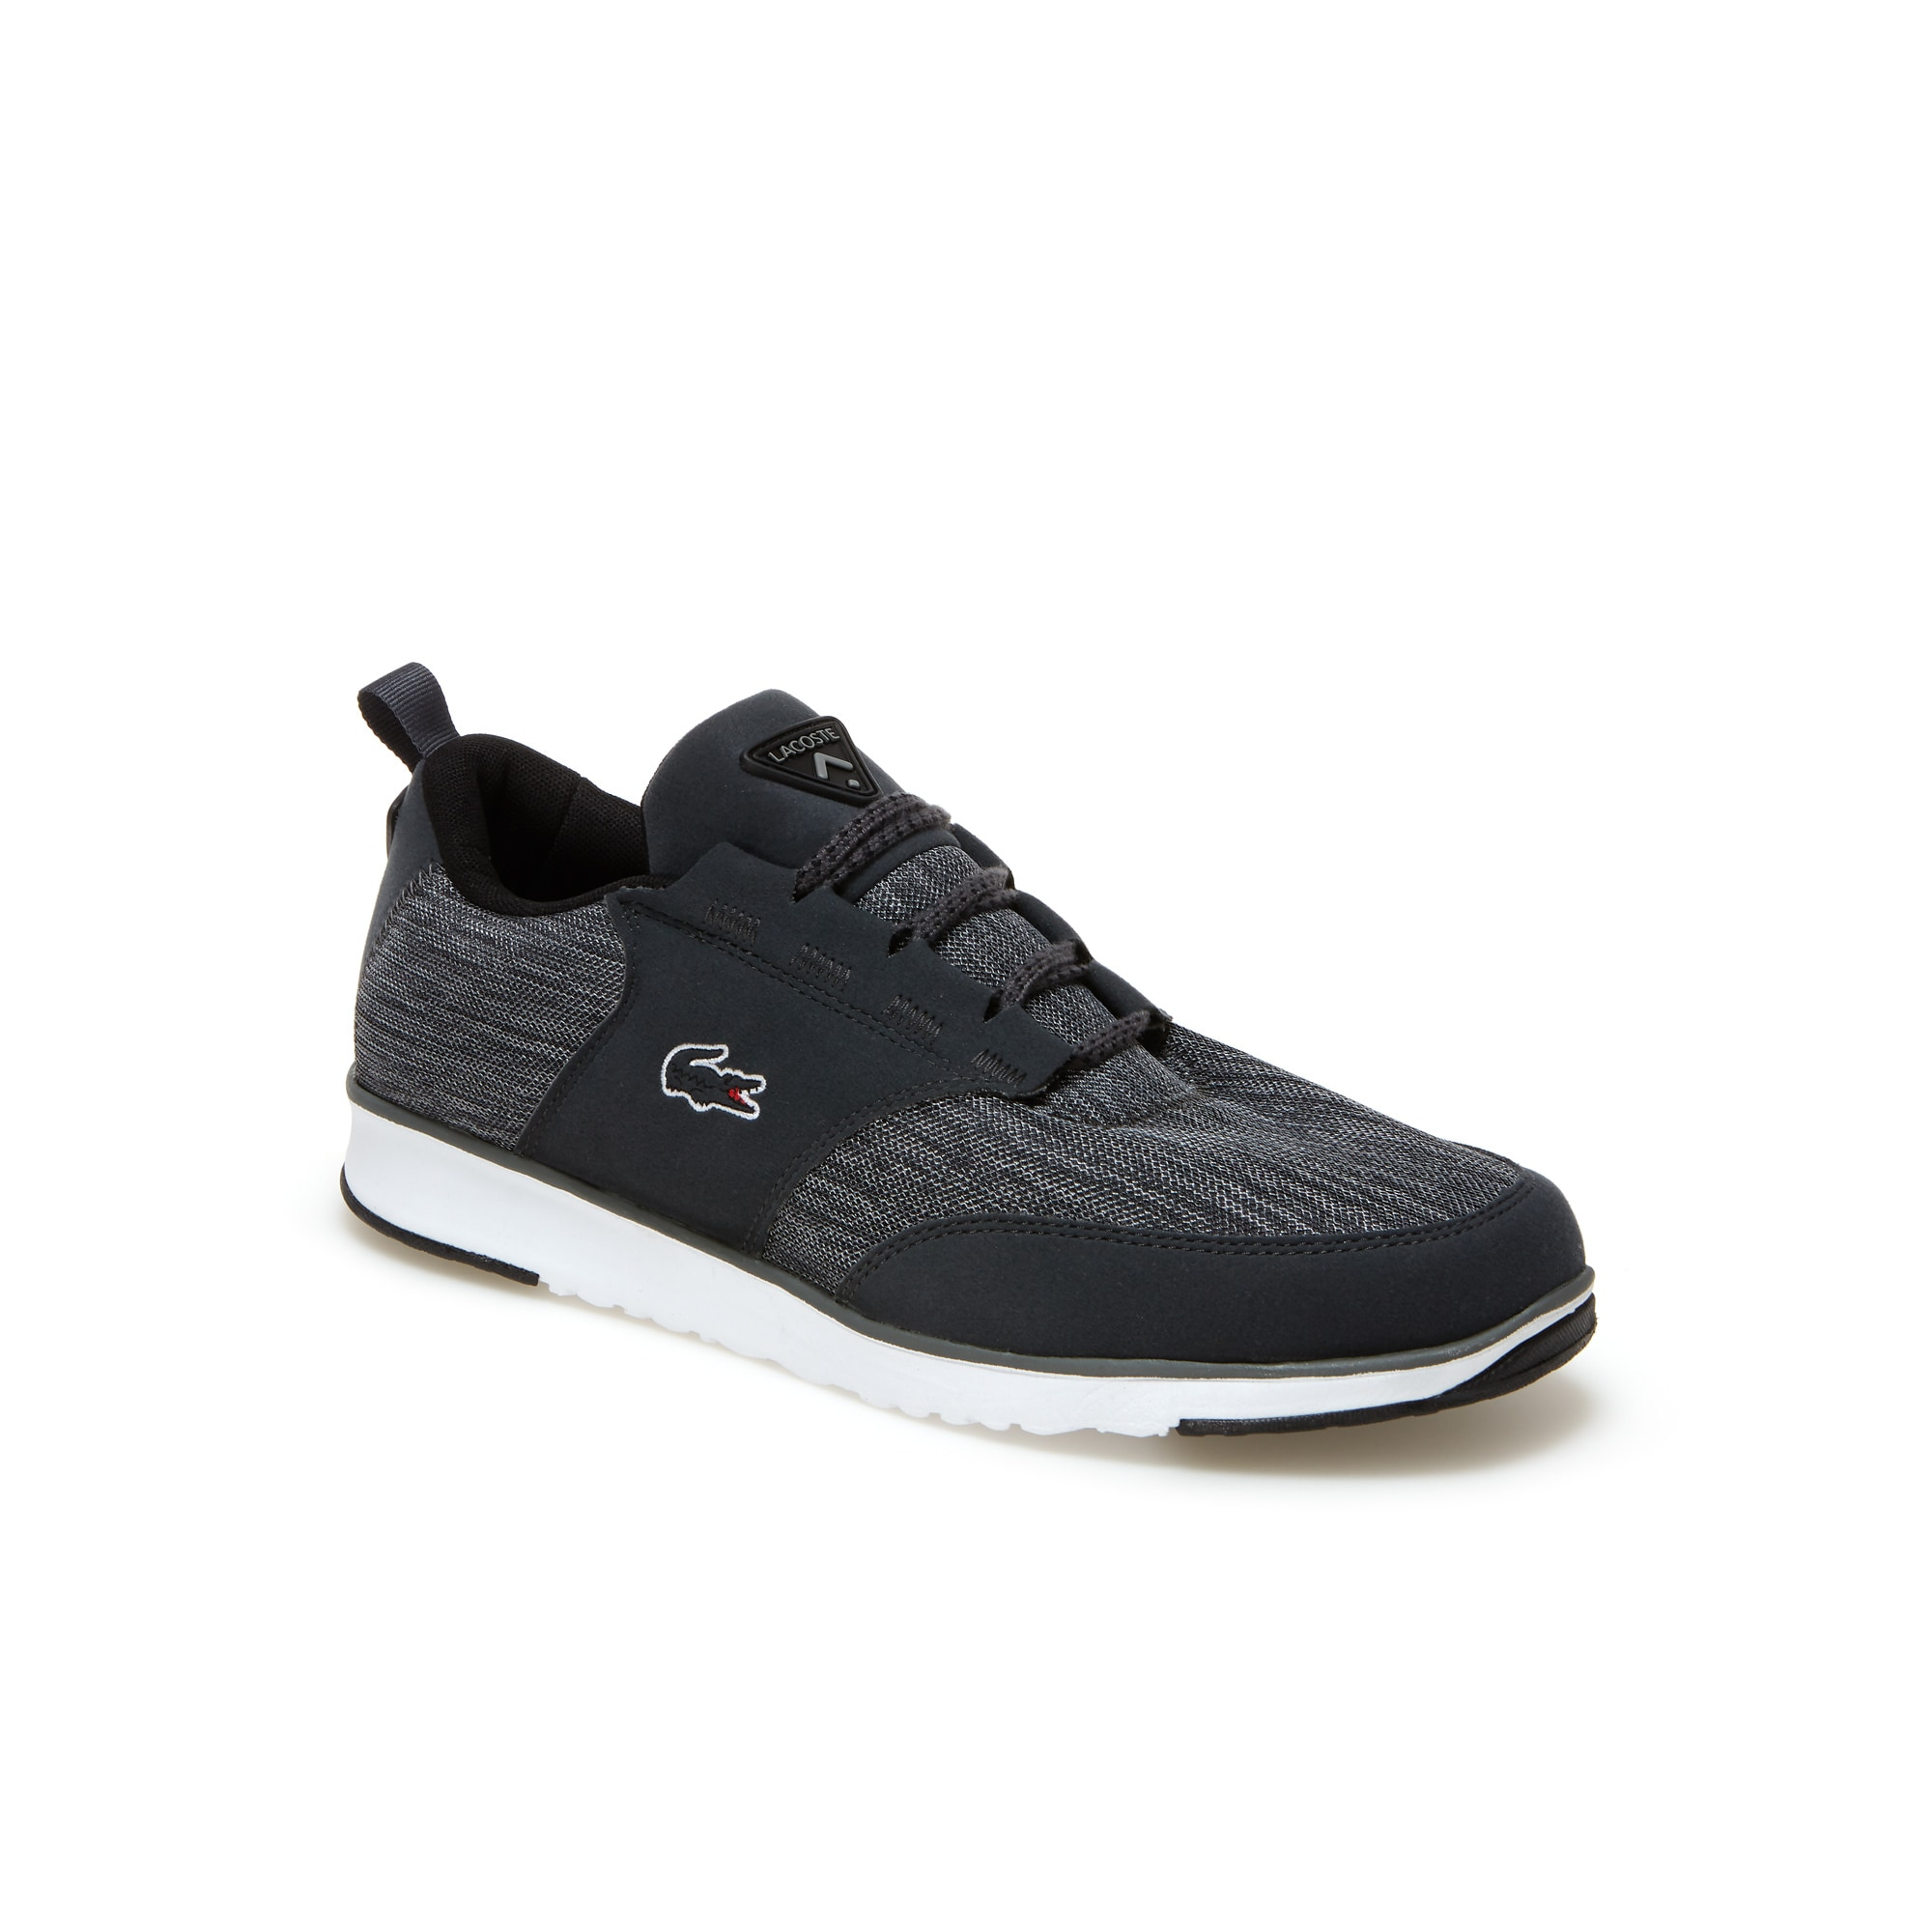 Men's L.ight Textile Sneakers